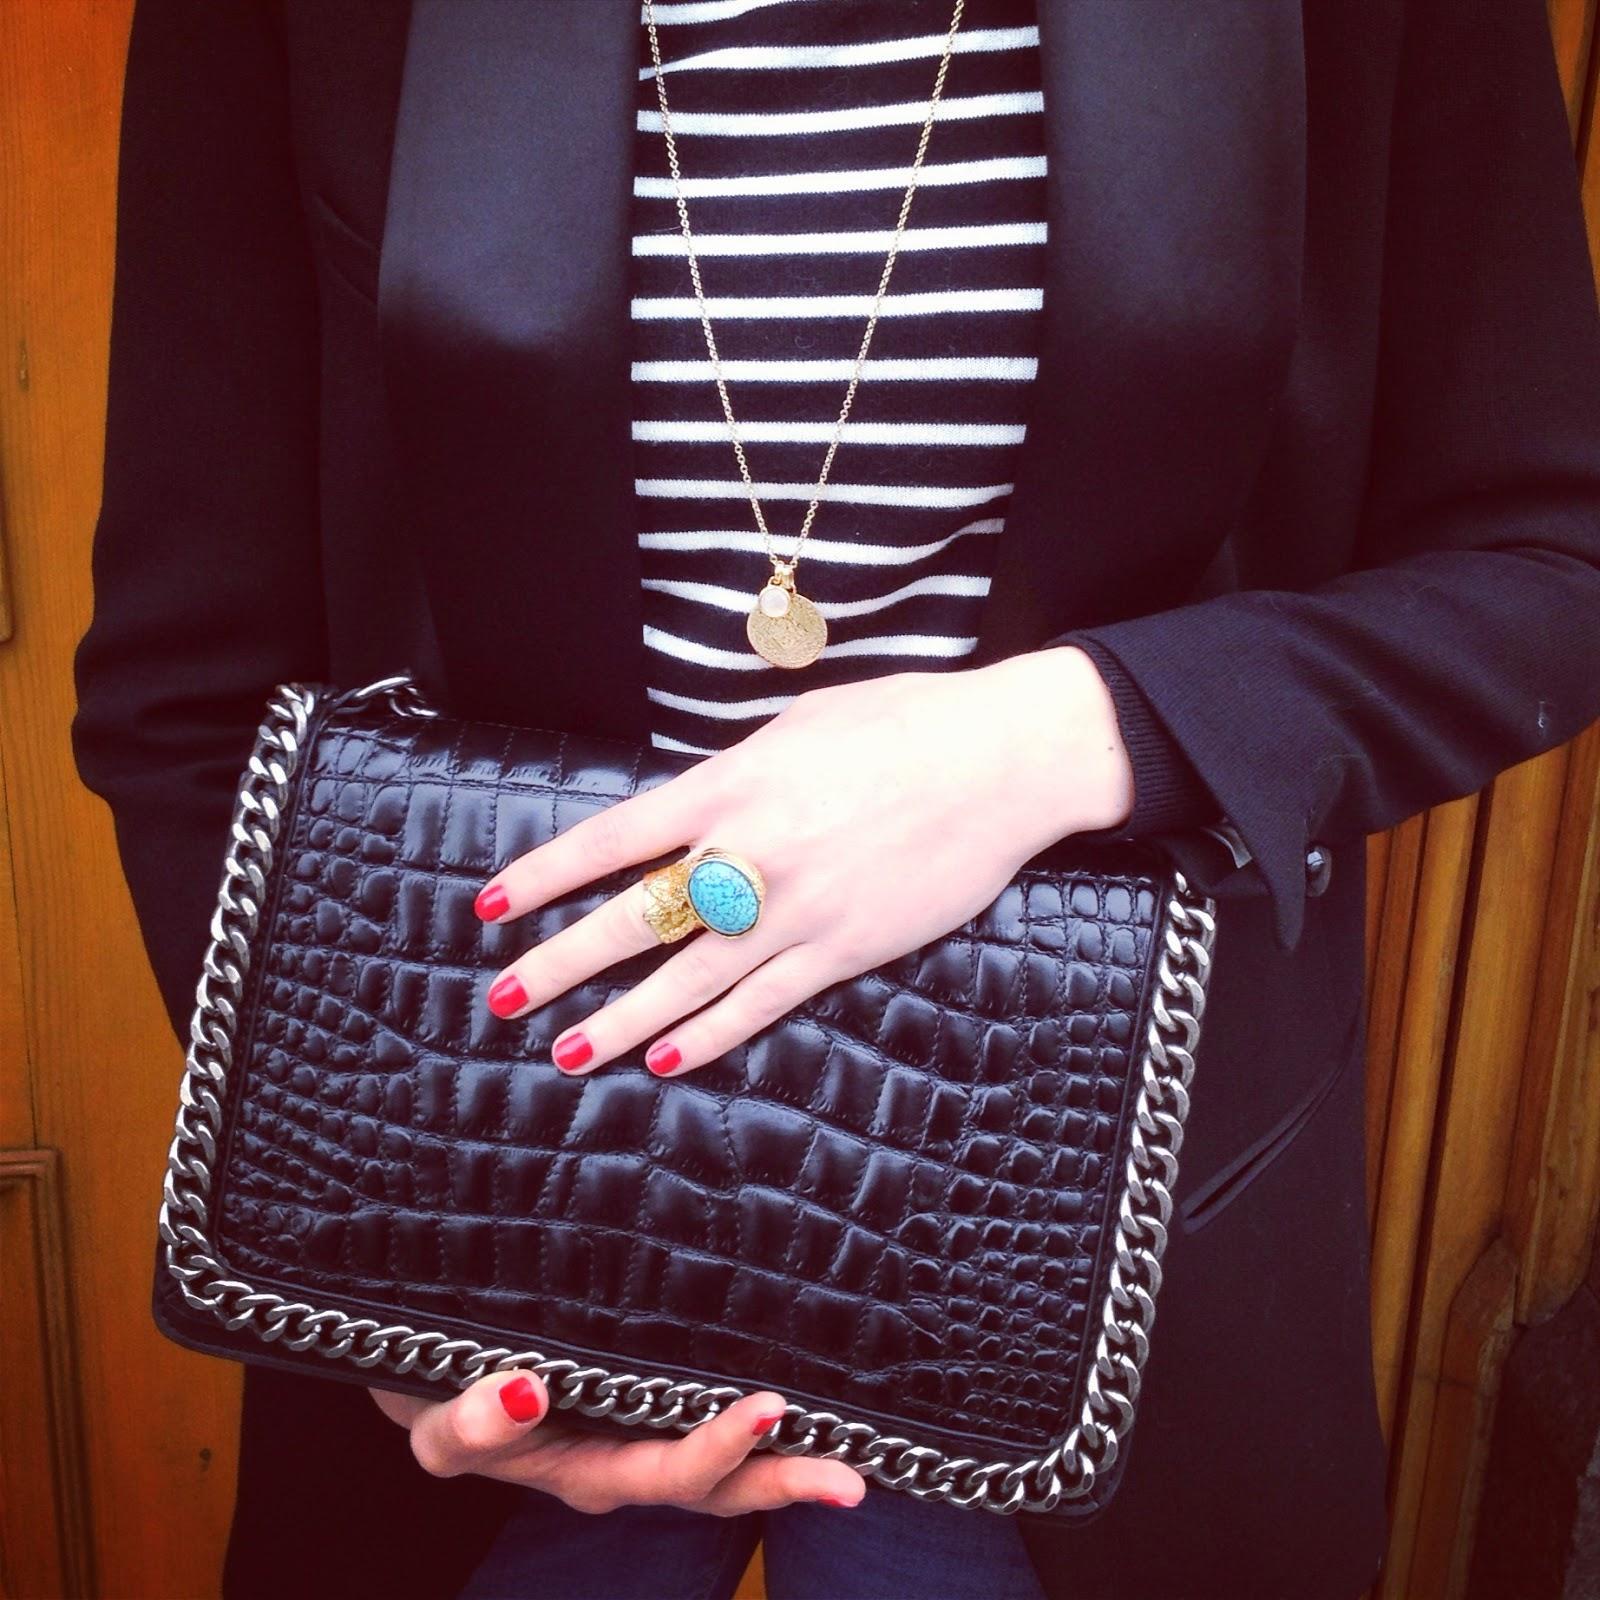 my week on instagram, zara bag, zara croco bag, isabel marant, isabel marant blazer, monica vinader, monica vinader jewellery